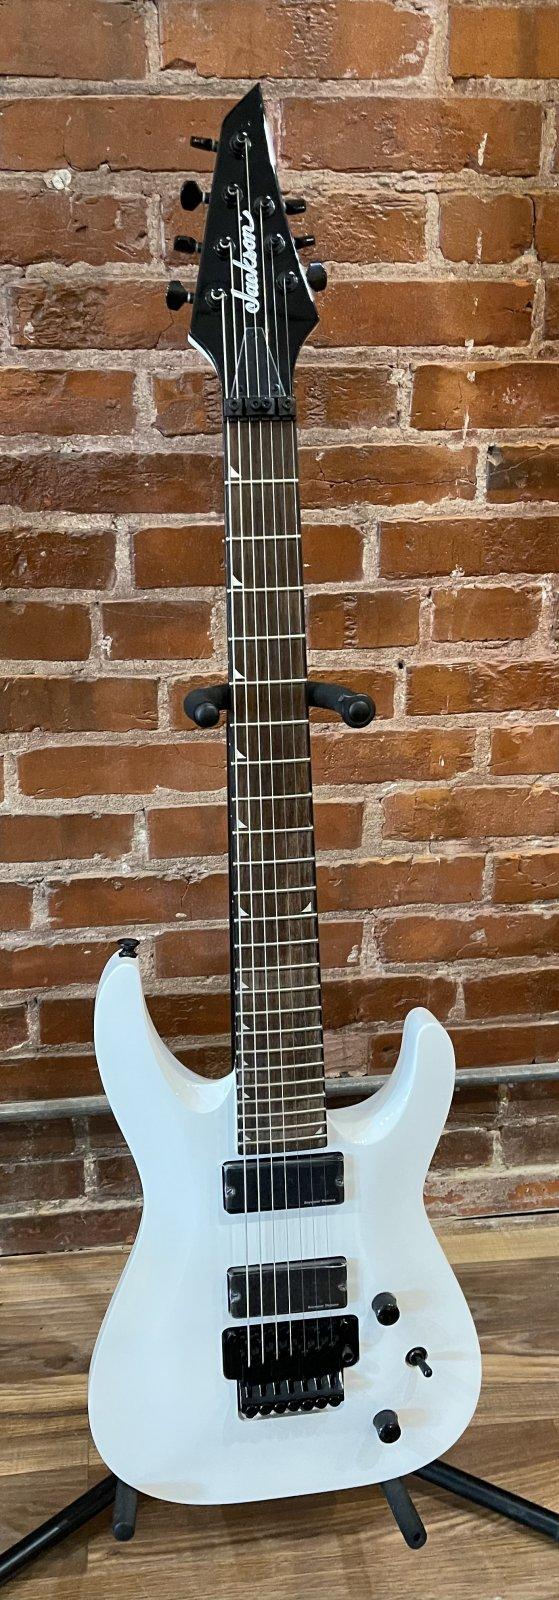 Jackson SLATXSD 3-7 7-String Electric Guitar (Snow White)